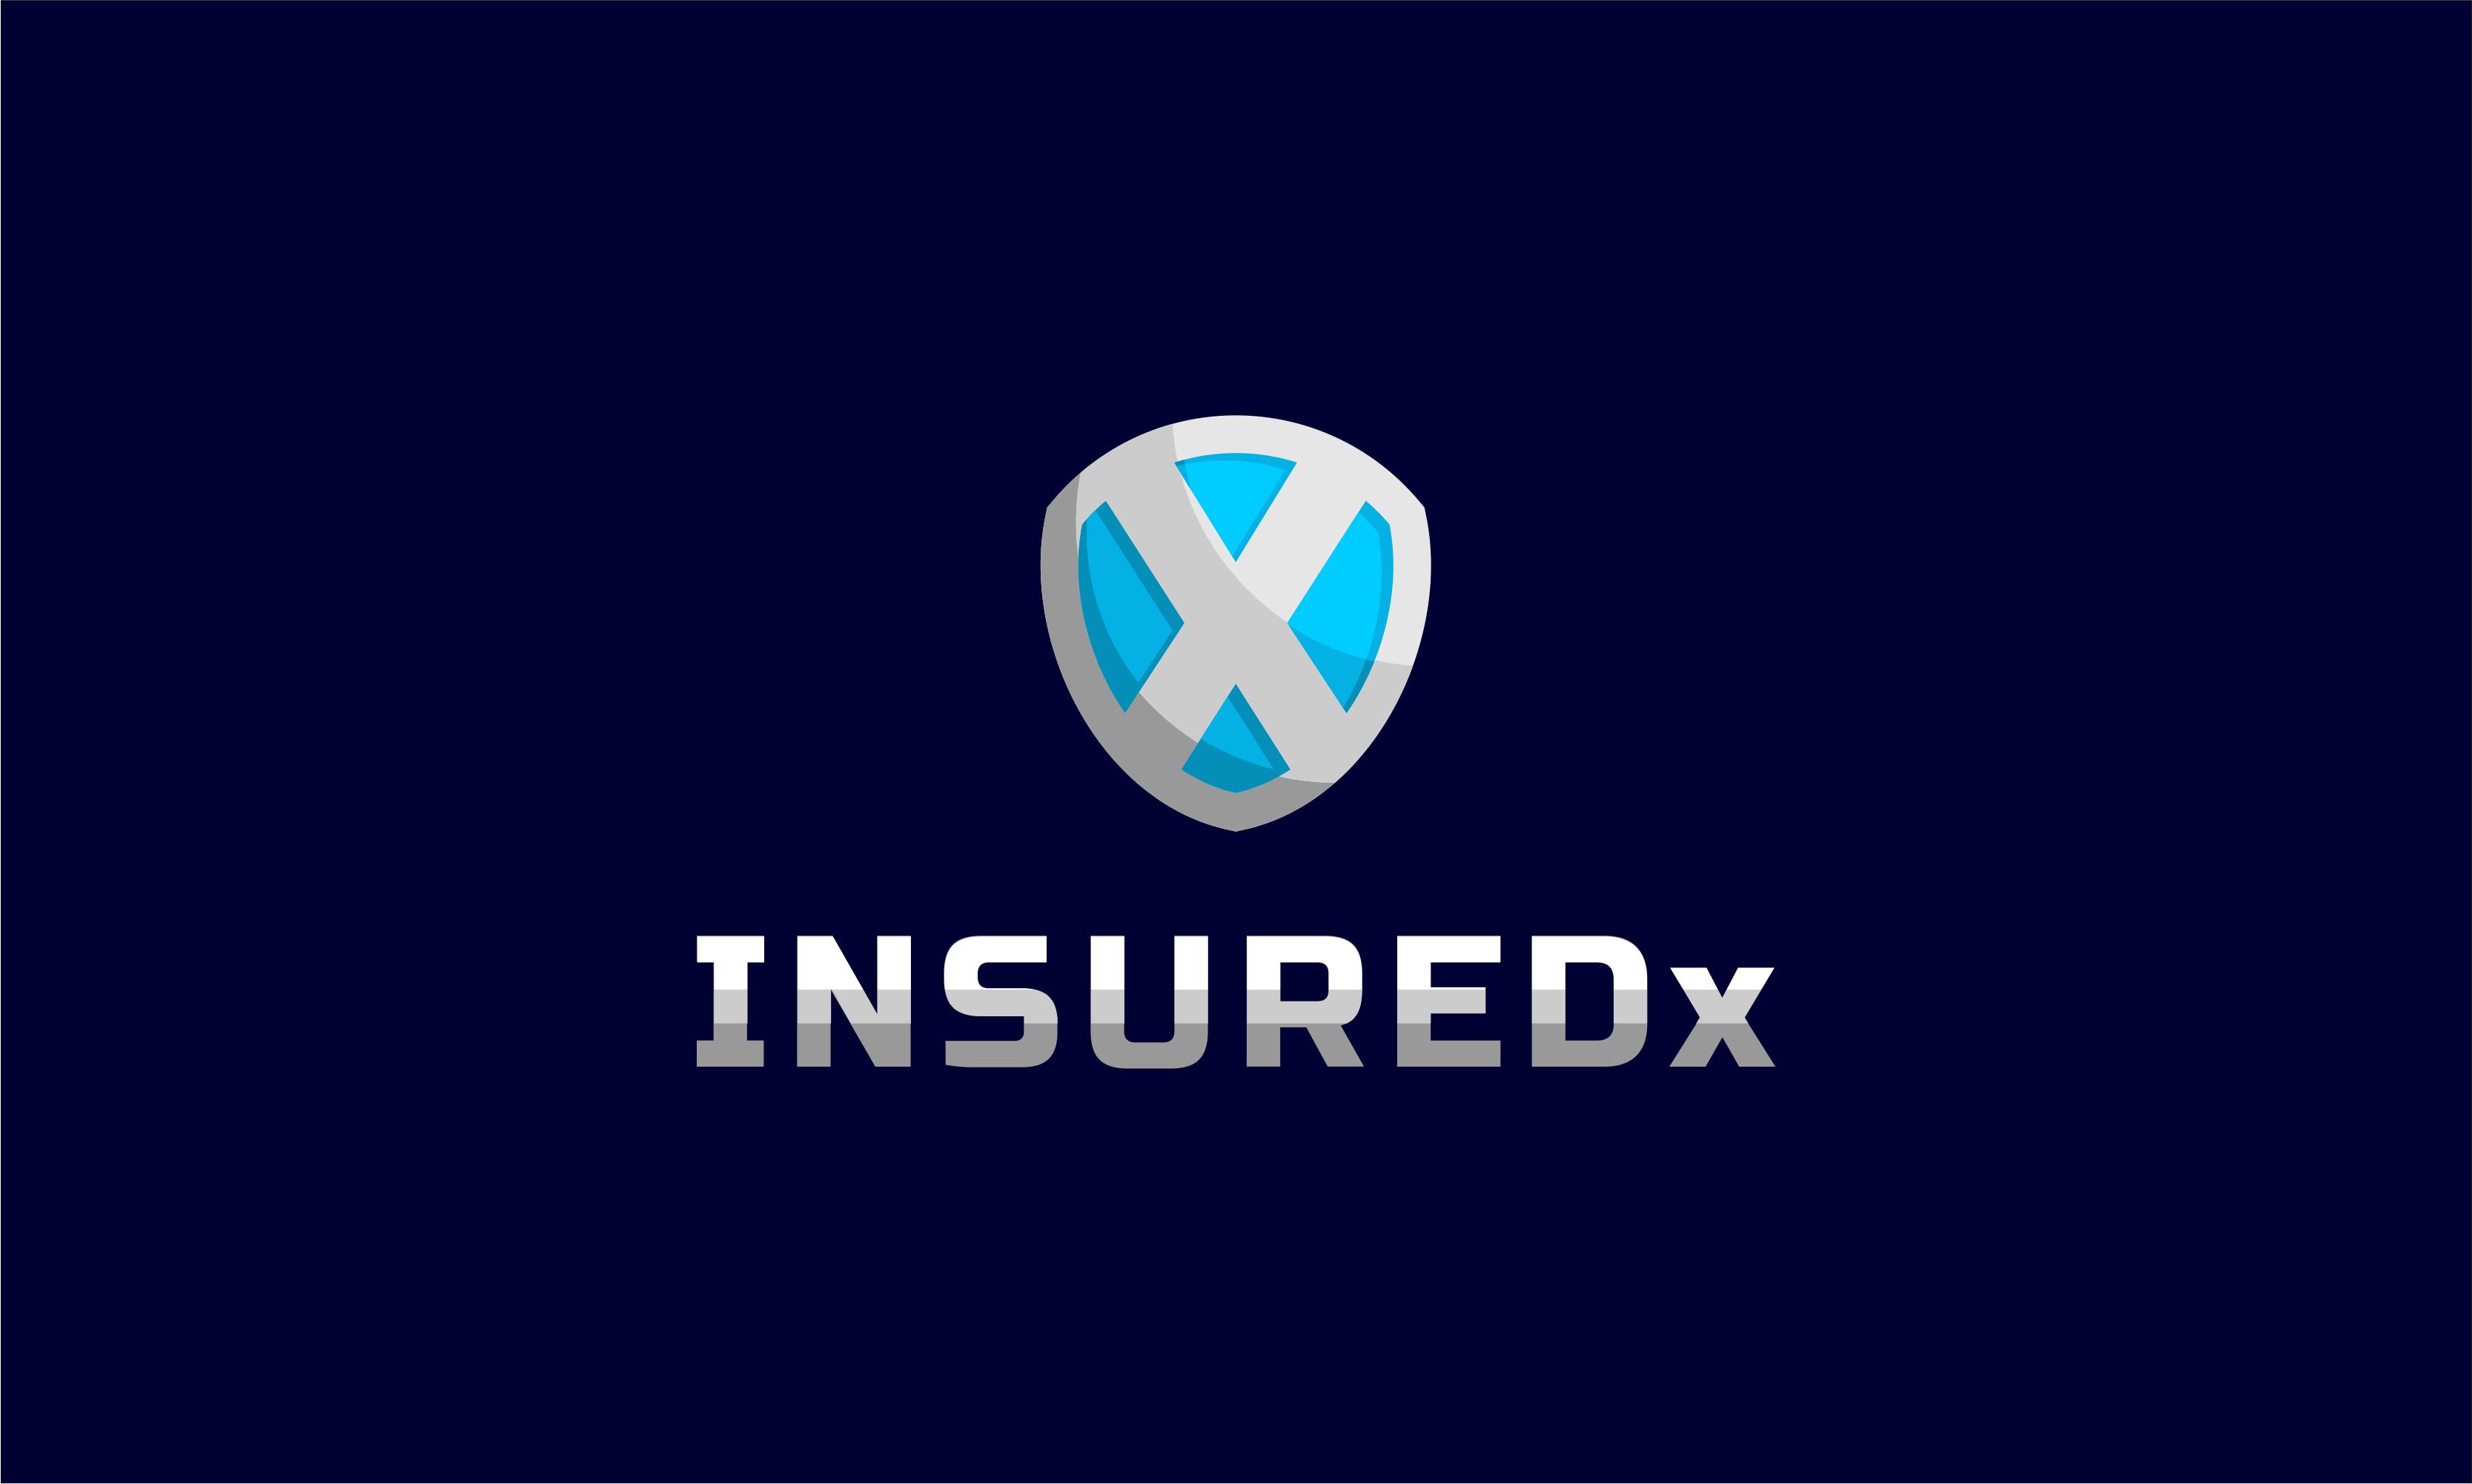 Insuredx